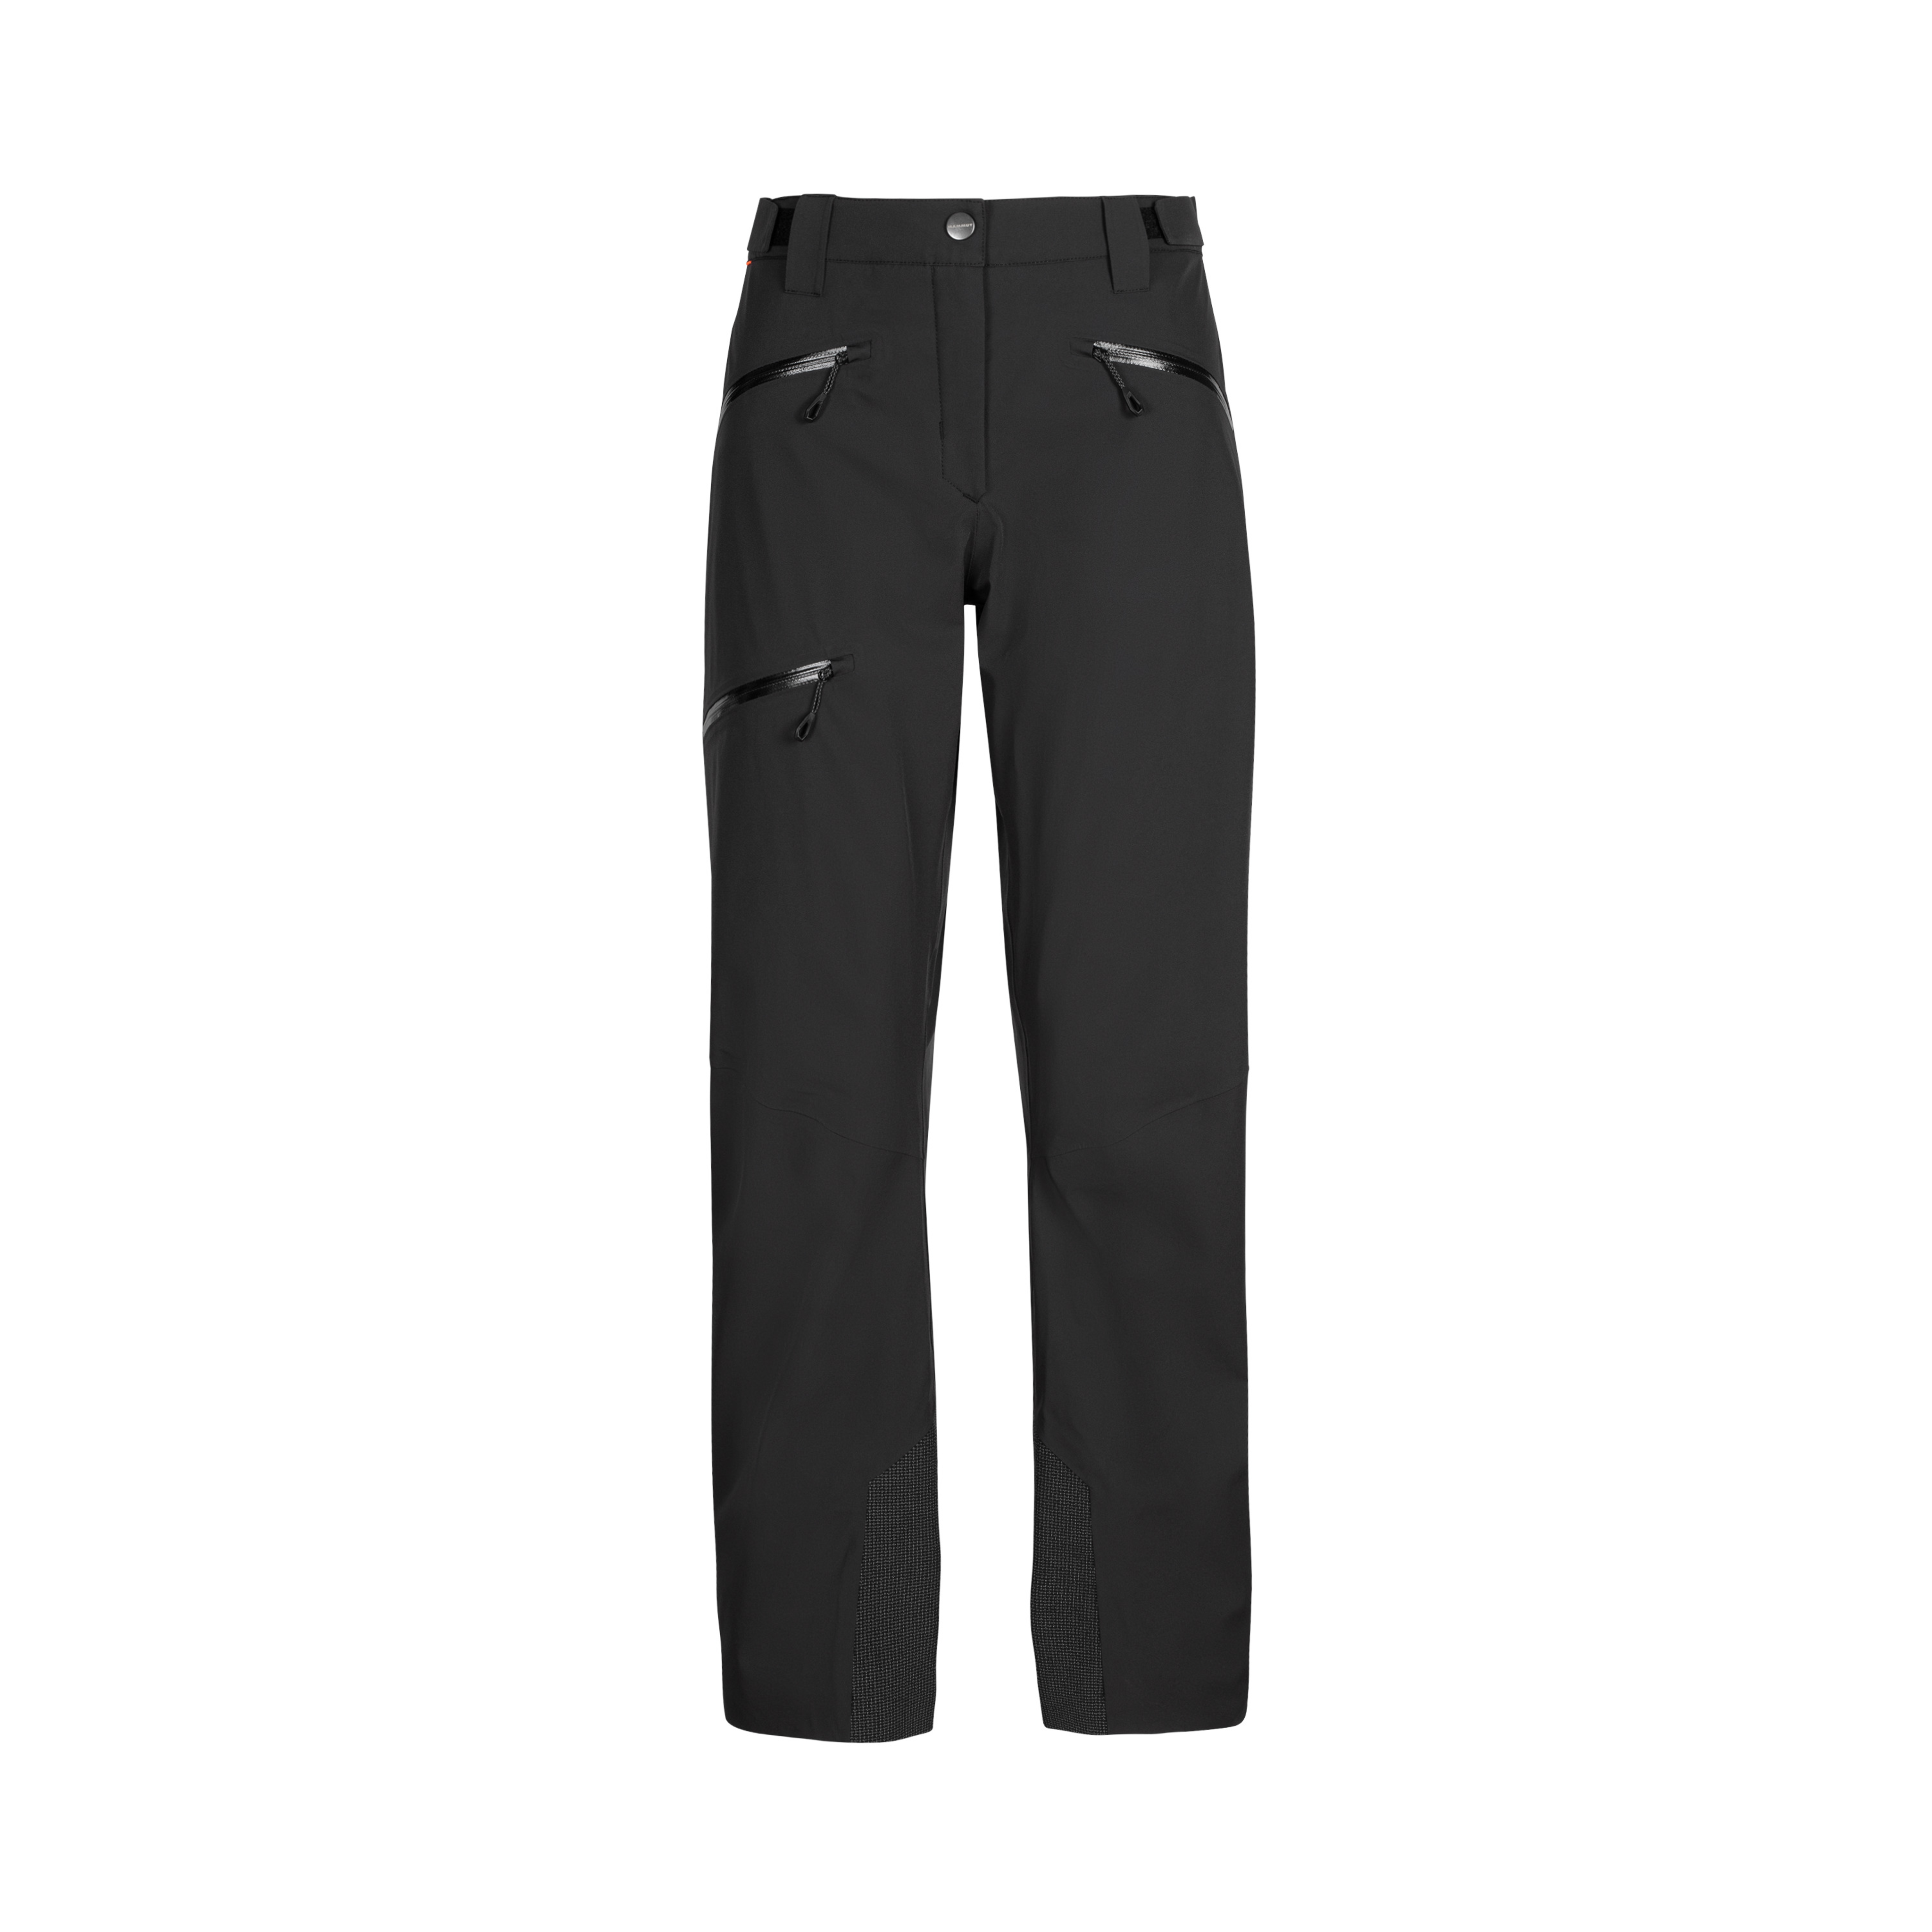 Stoney HS Pants Women - black, normal, UK 6 thumbnail